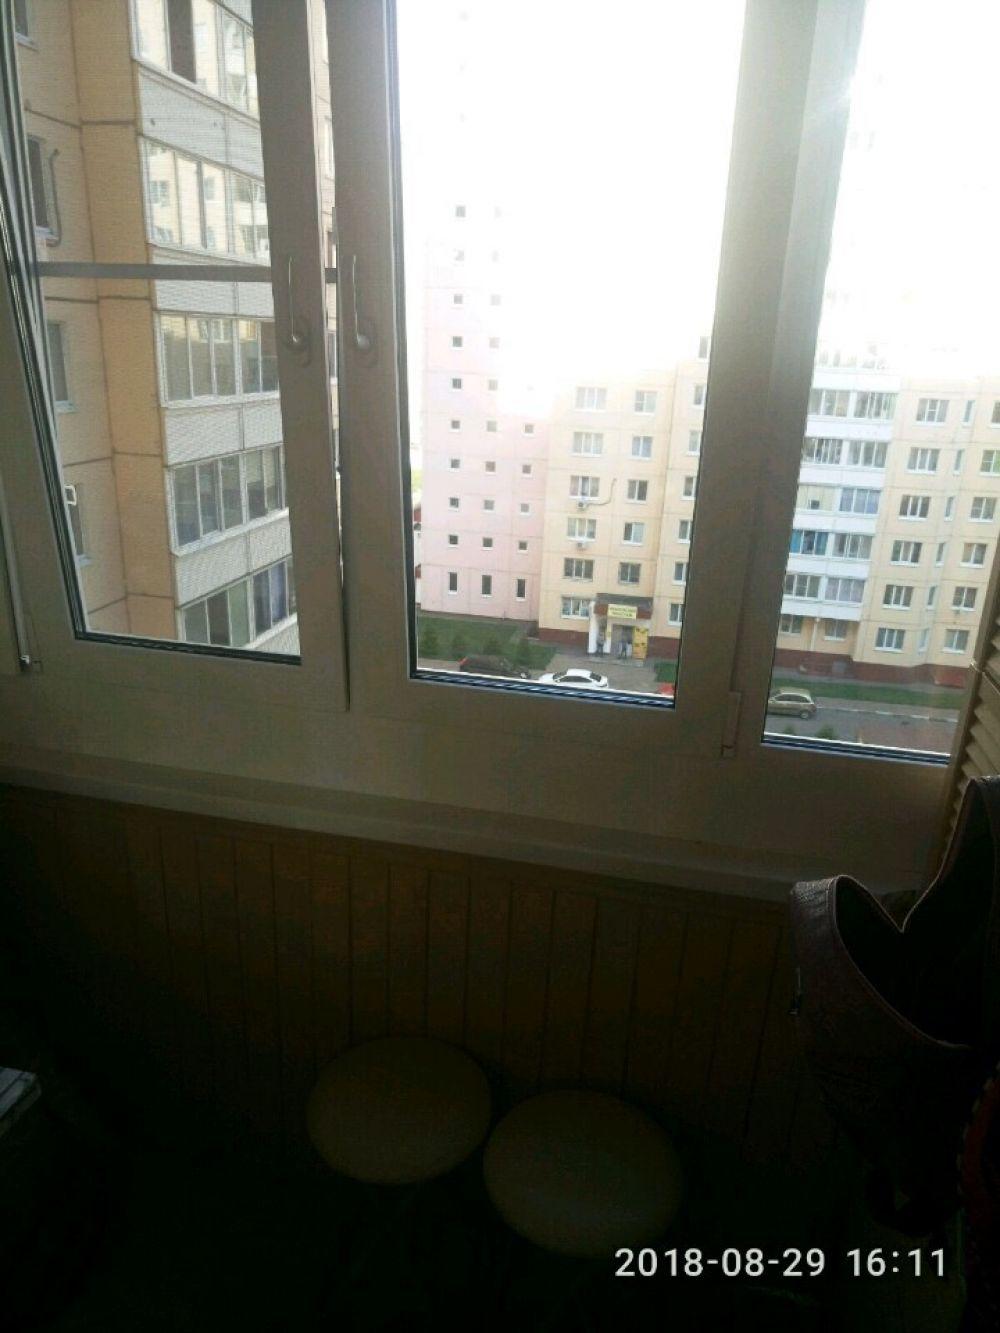 2-к квартира, 56 м2, 7/16 эт. Фрязино, ул горького д.  7, фото 3